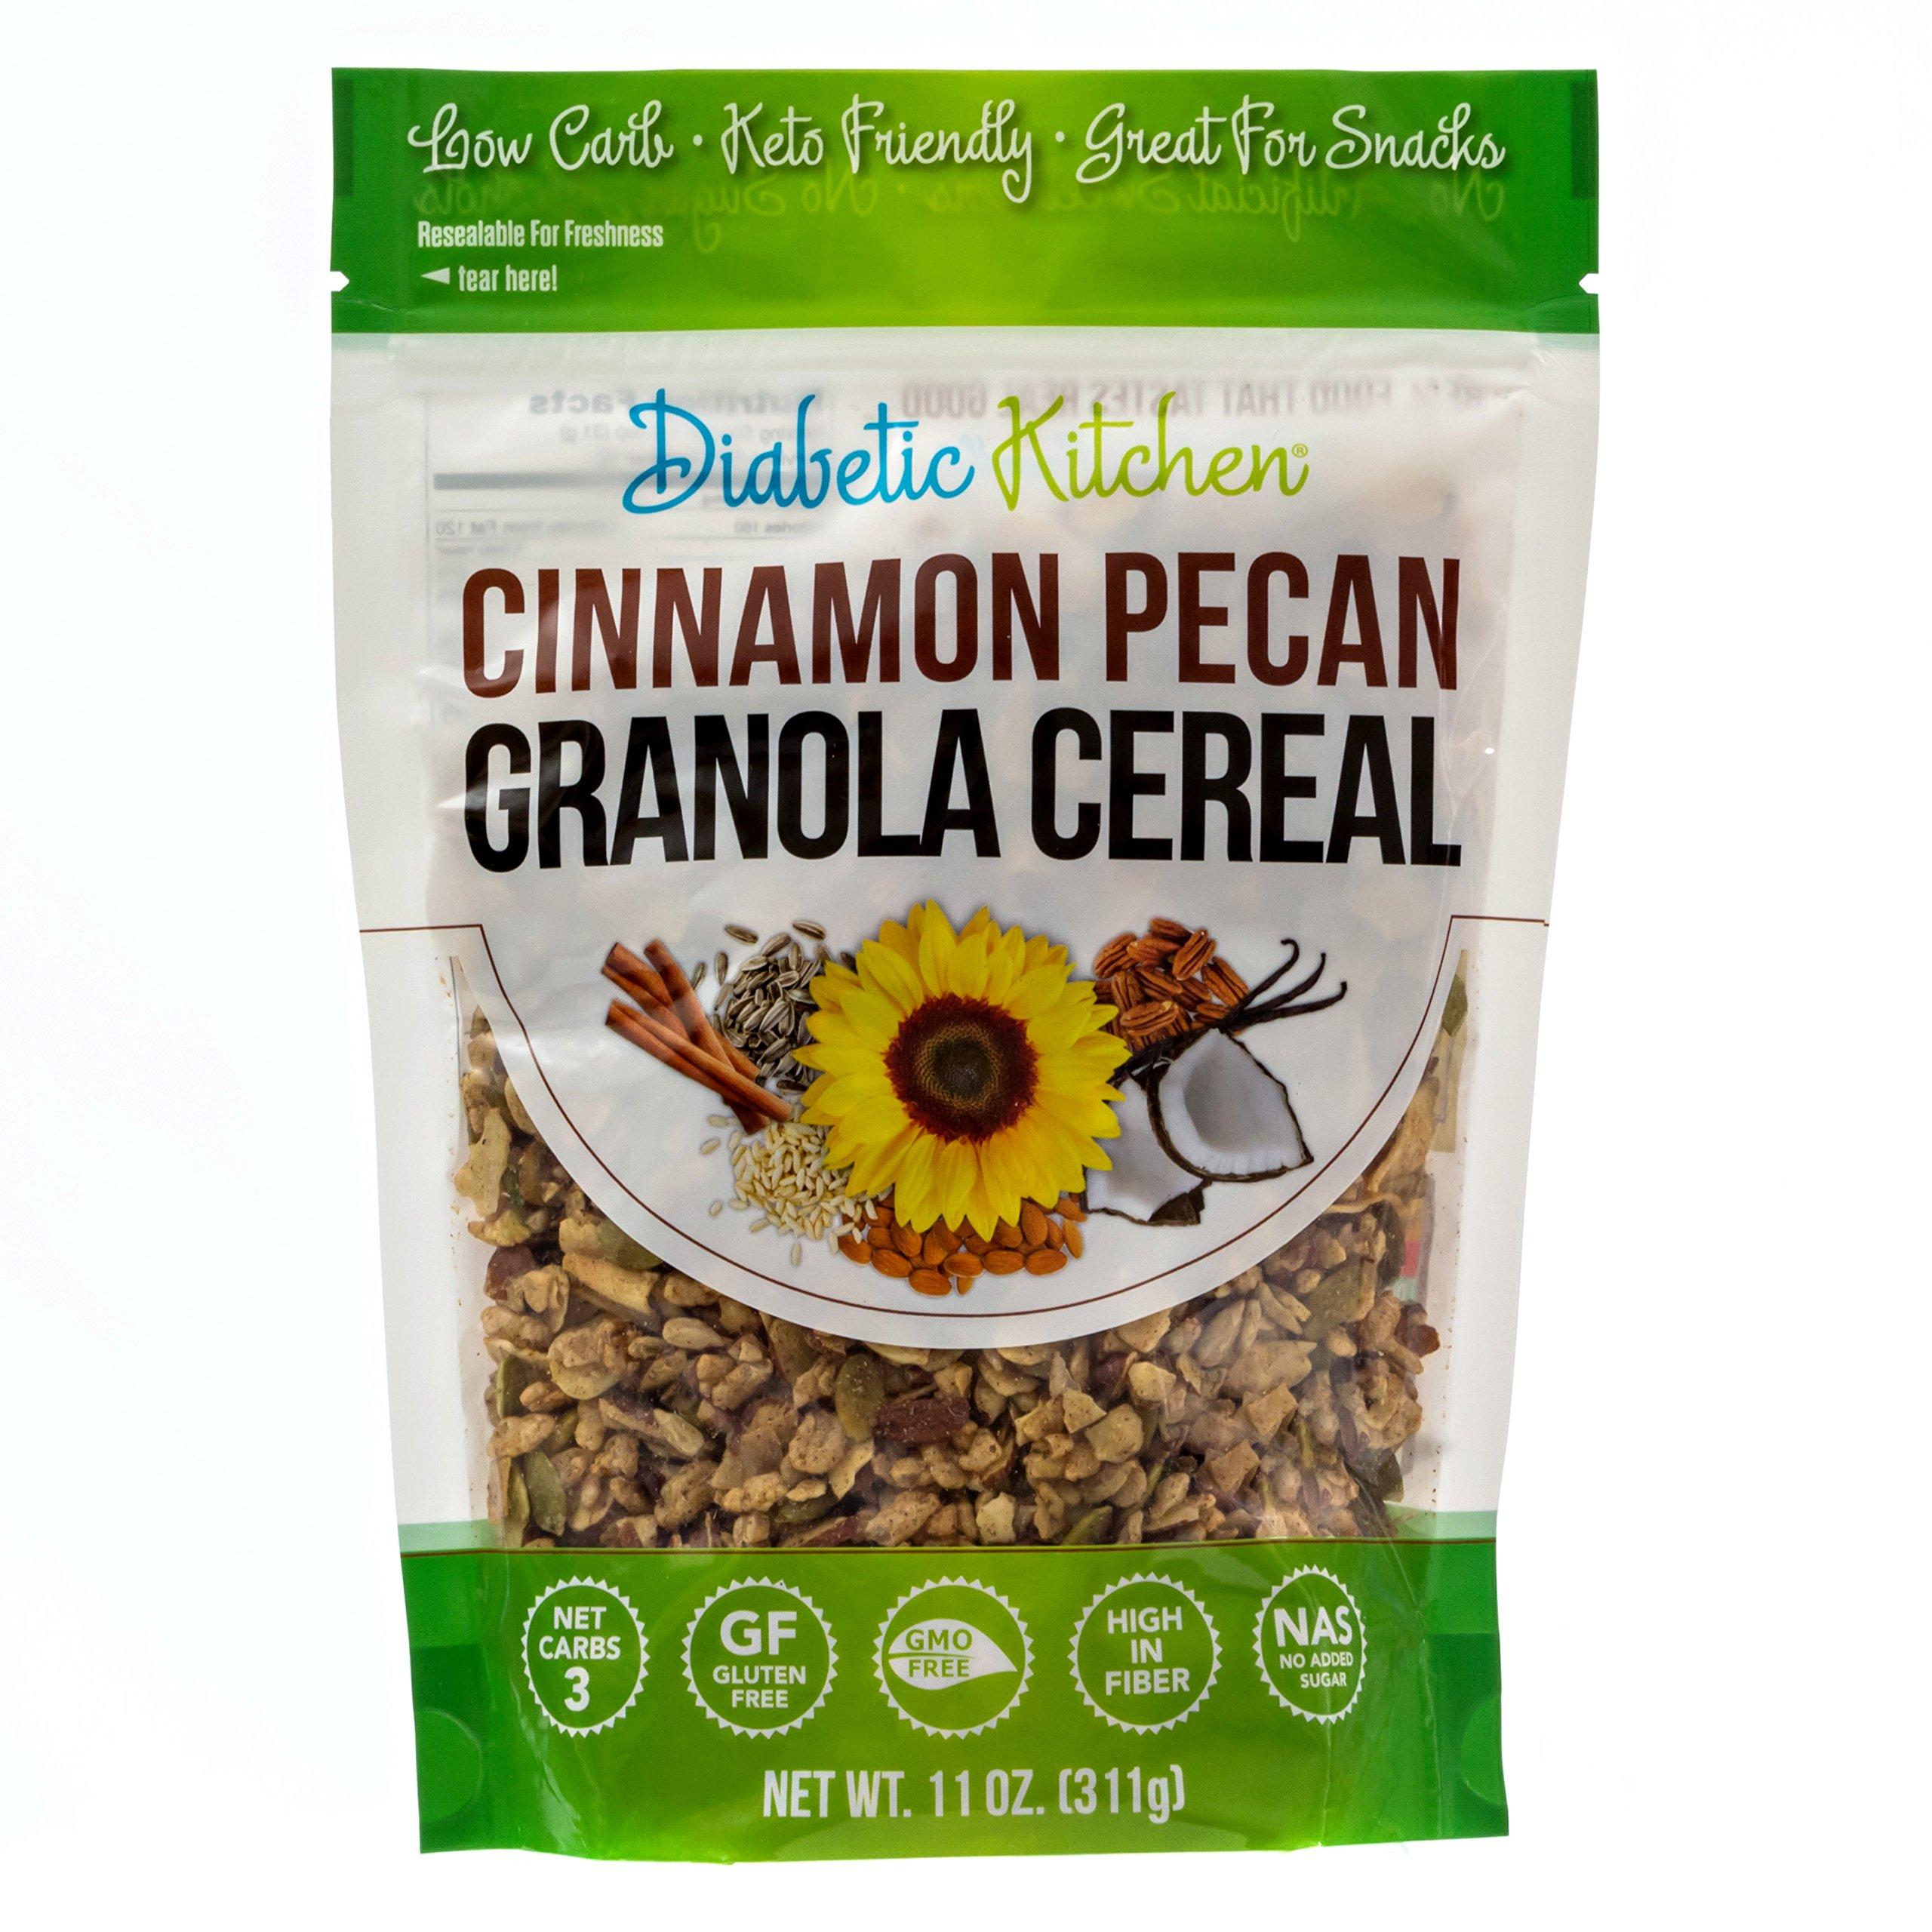 Diabetic Kitchen Cinnamon Pecan Granola Cereal, 3g Net Carbs, Keto Friendly, Low Carb, No Sugar Added, Gluten-Free, 5g Fiber, Non-GMO, No Artificial Sweeteners or Sugar Alcohols (11 oz) by Diabetic Kitchen